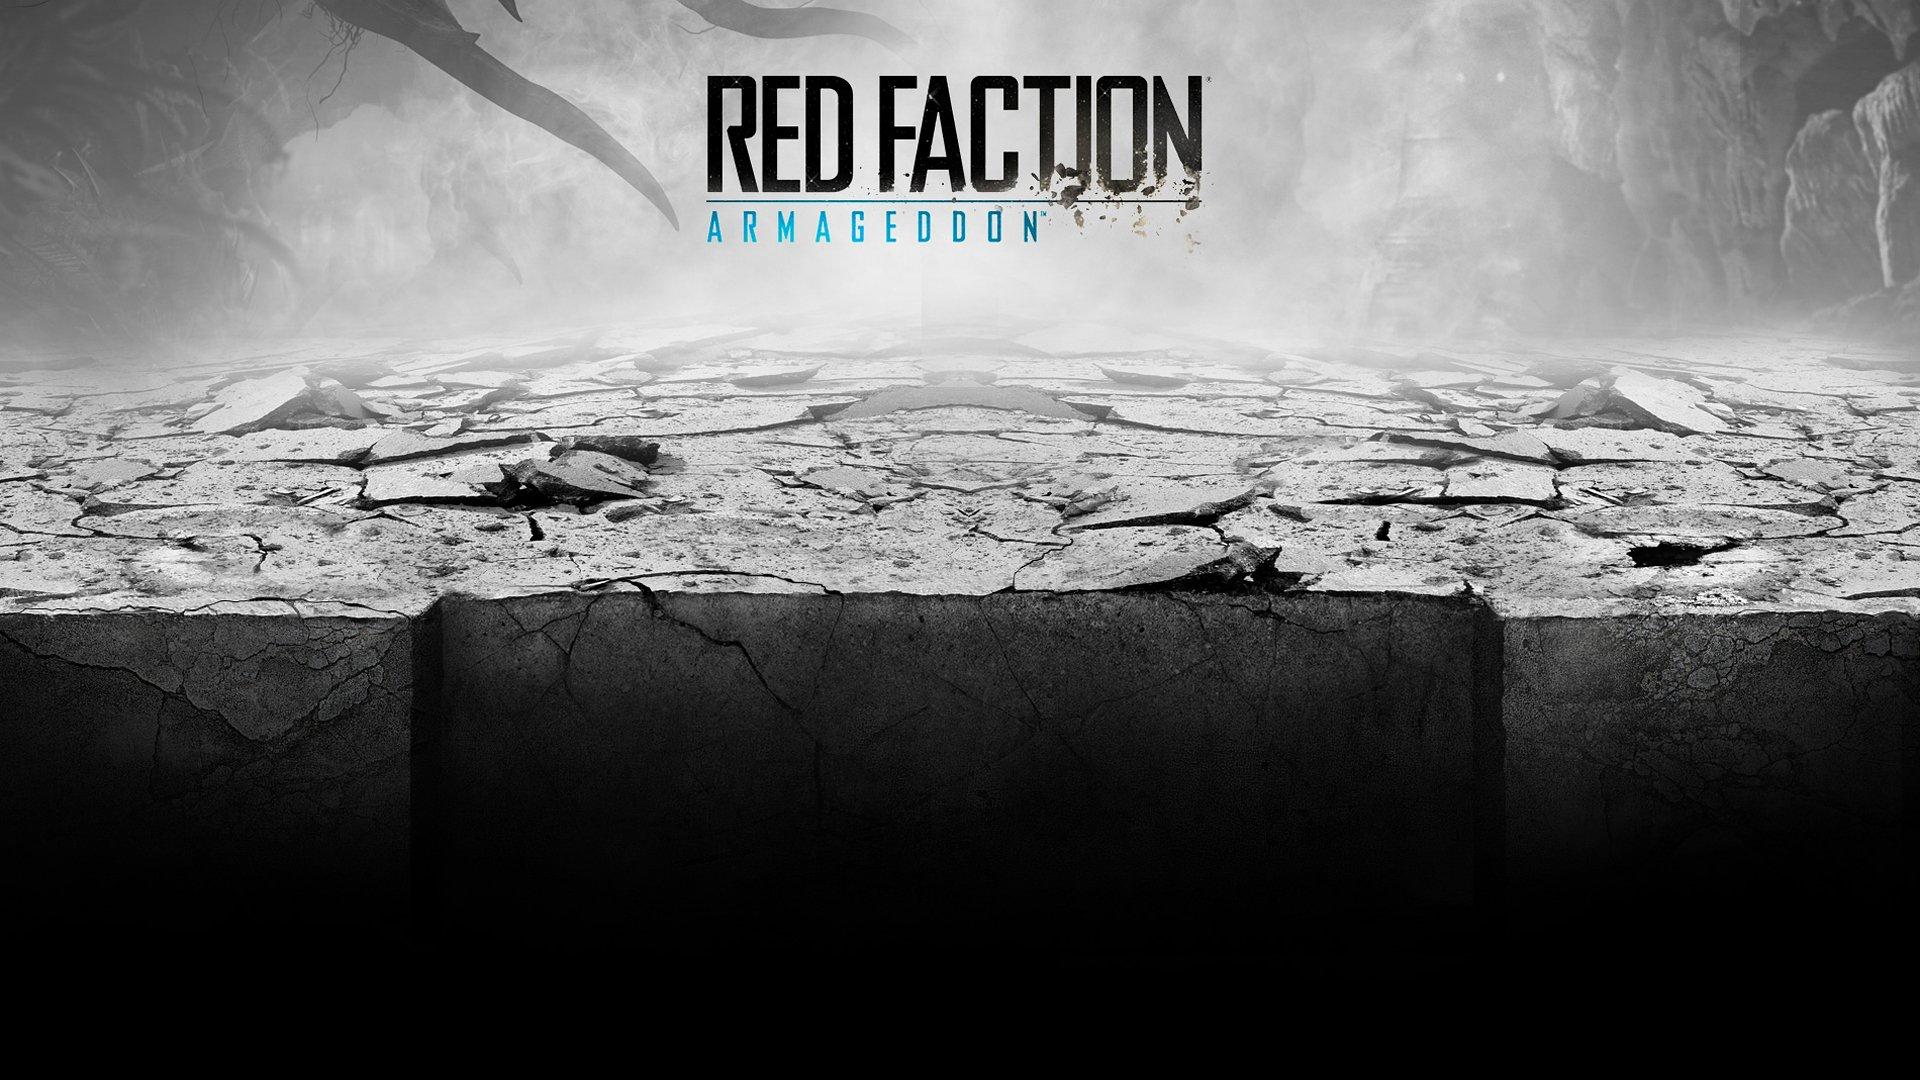 1920x1080 Red Faction: Armageddon desktop PC and Mac wallpaper